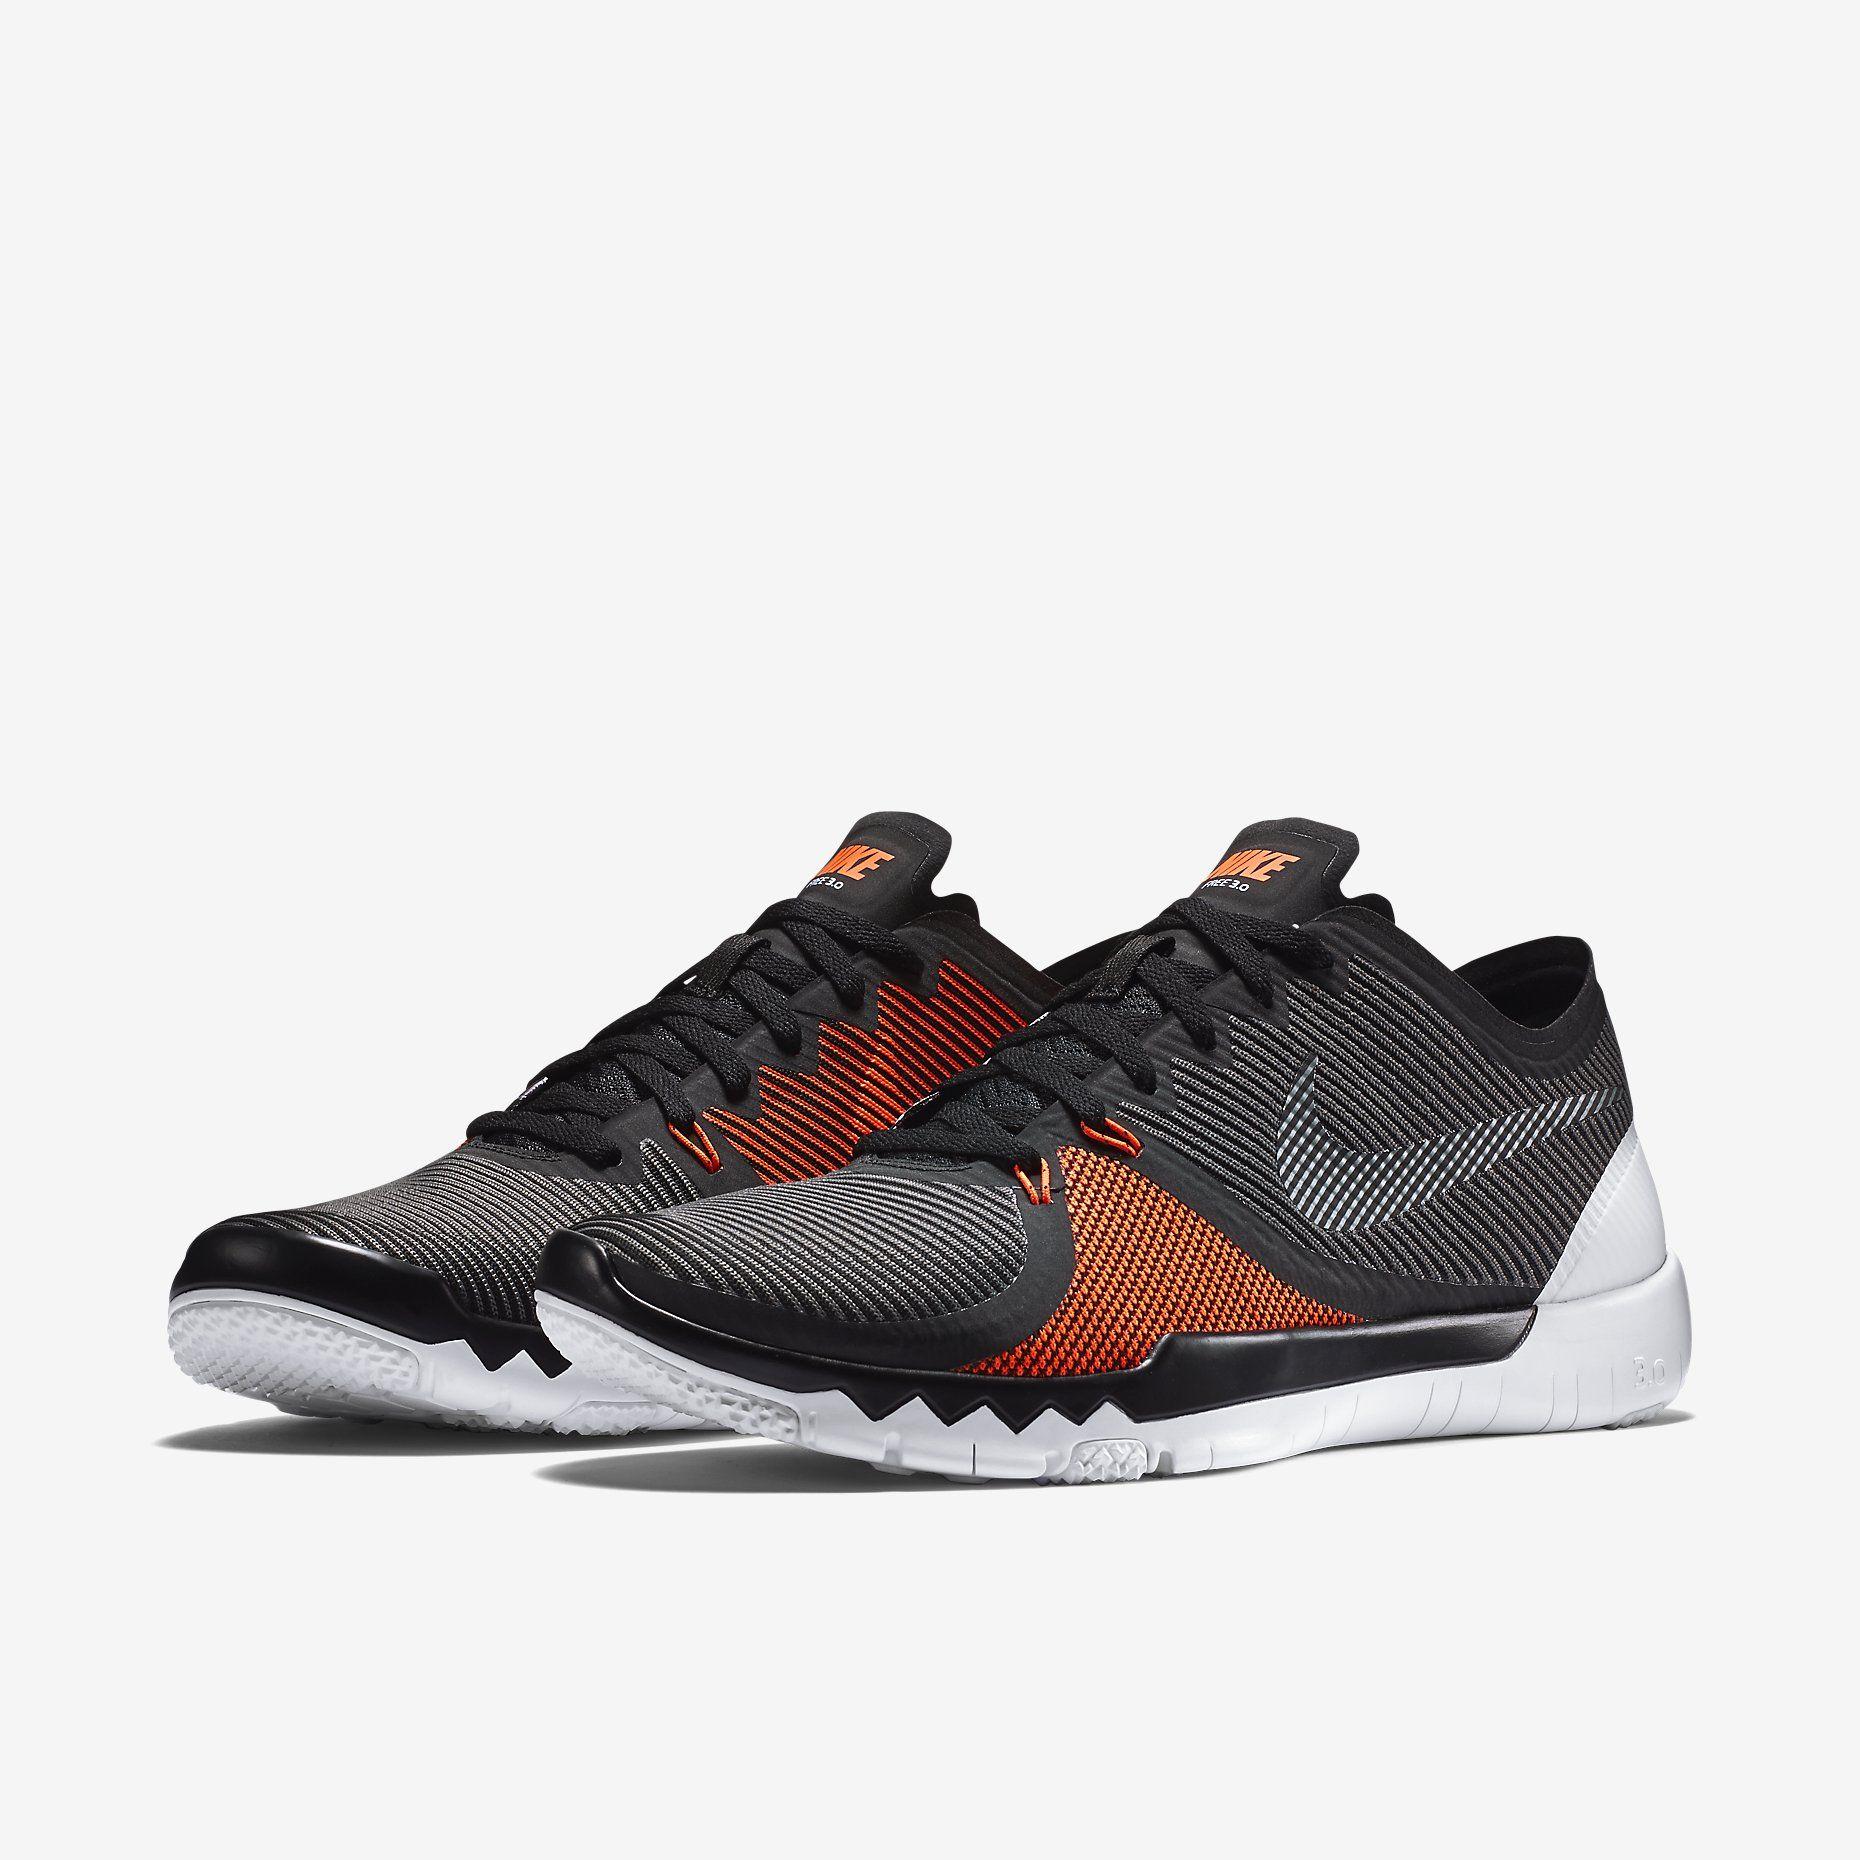 Basket homme, Chaussure, Chaussure sport homme